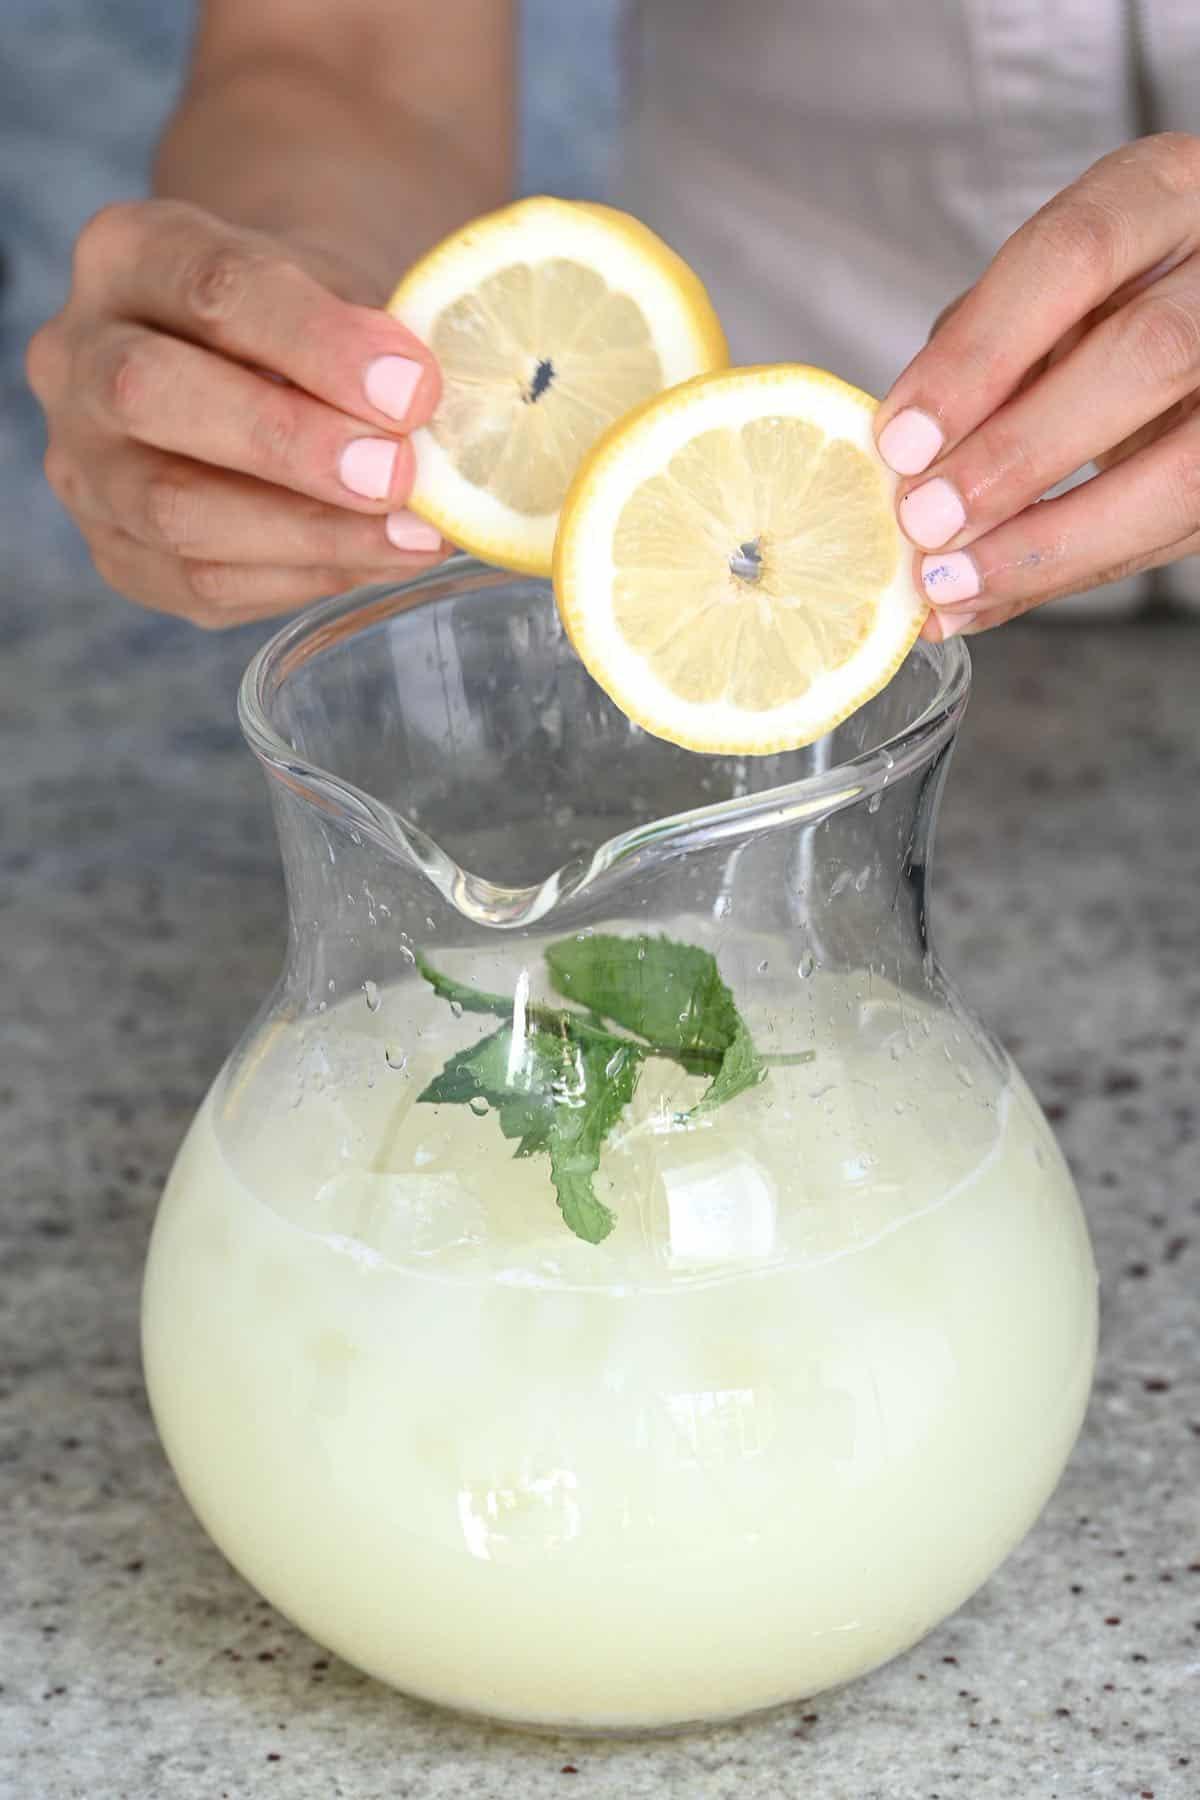 Adding lemon slices to creamy lemonade